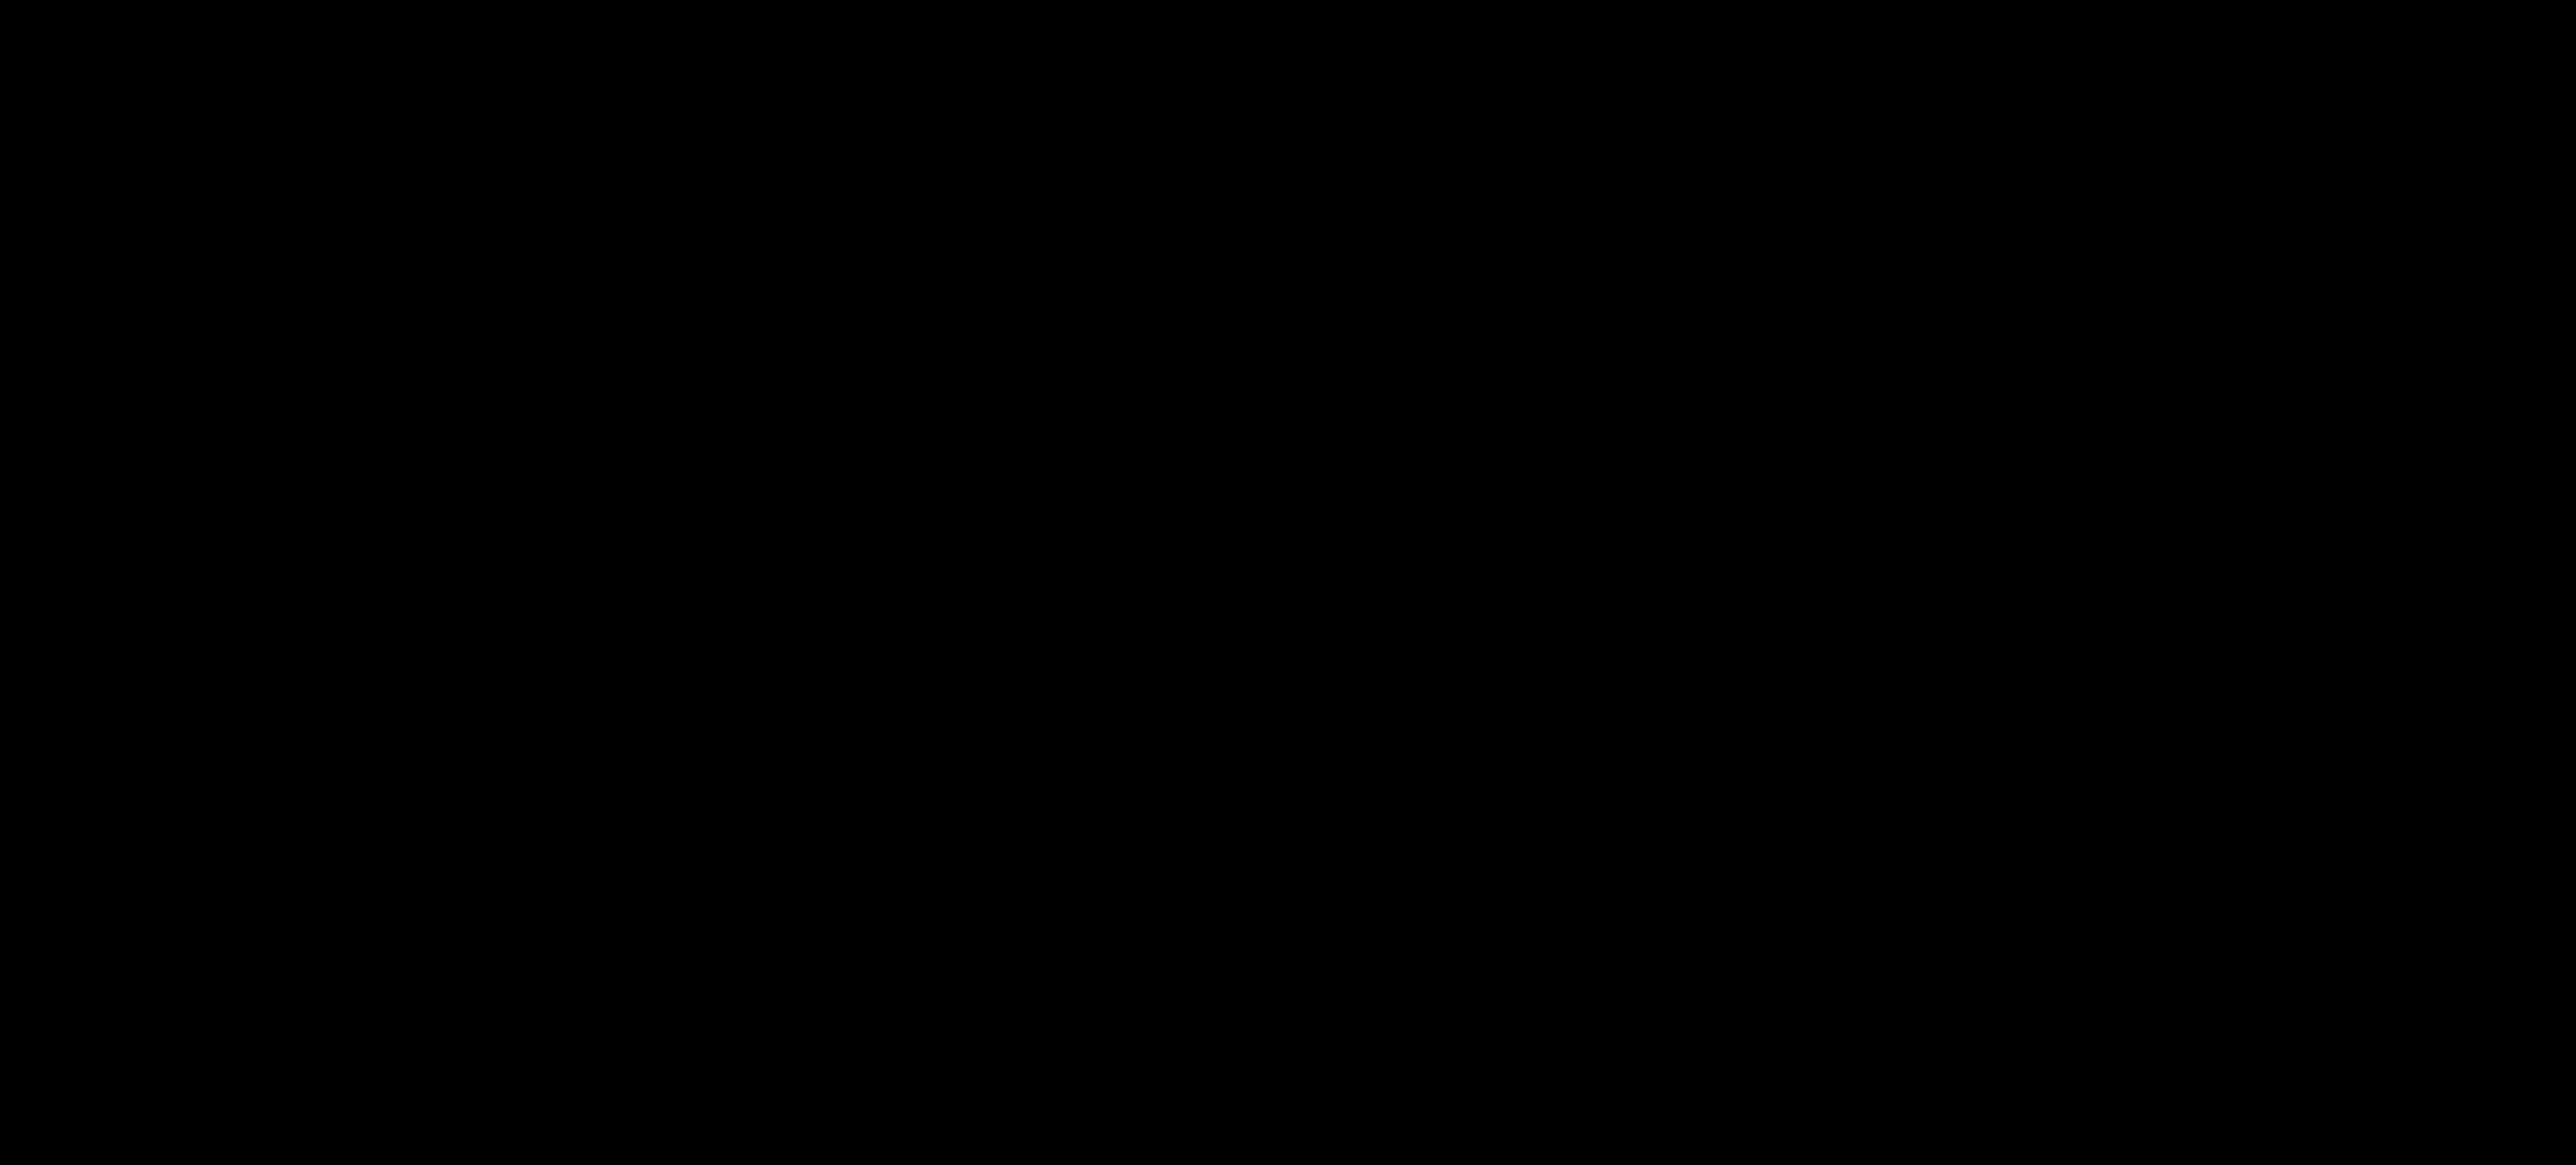 adenosine triphosphate - wikipedia